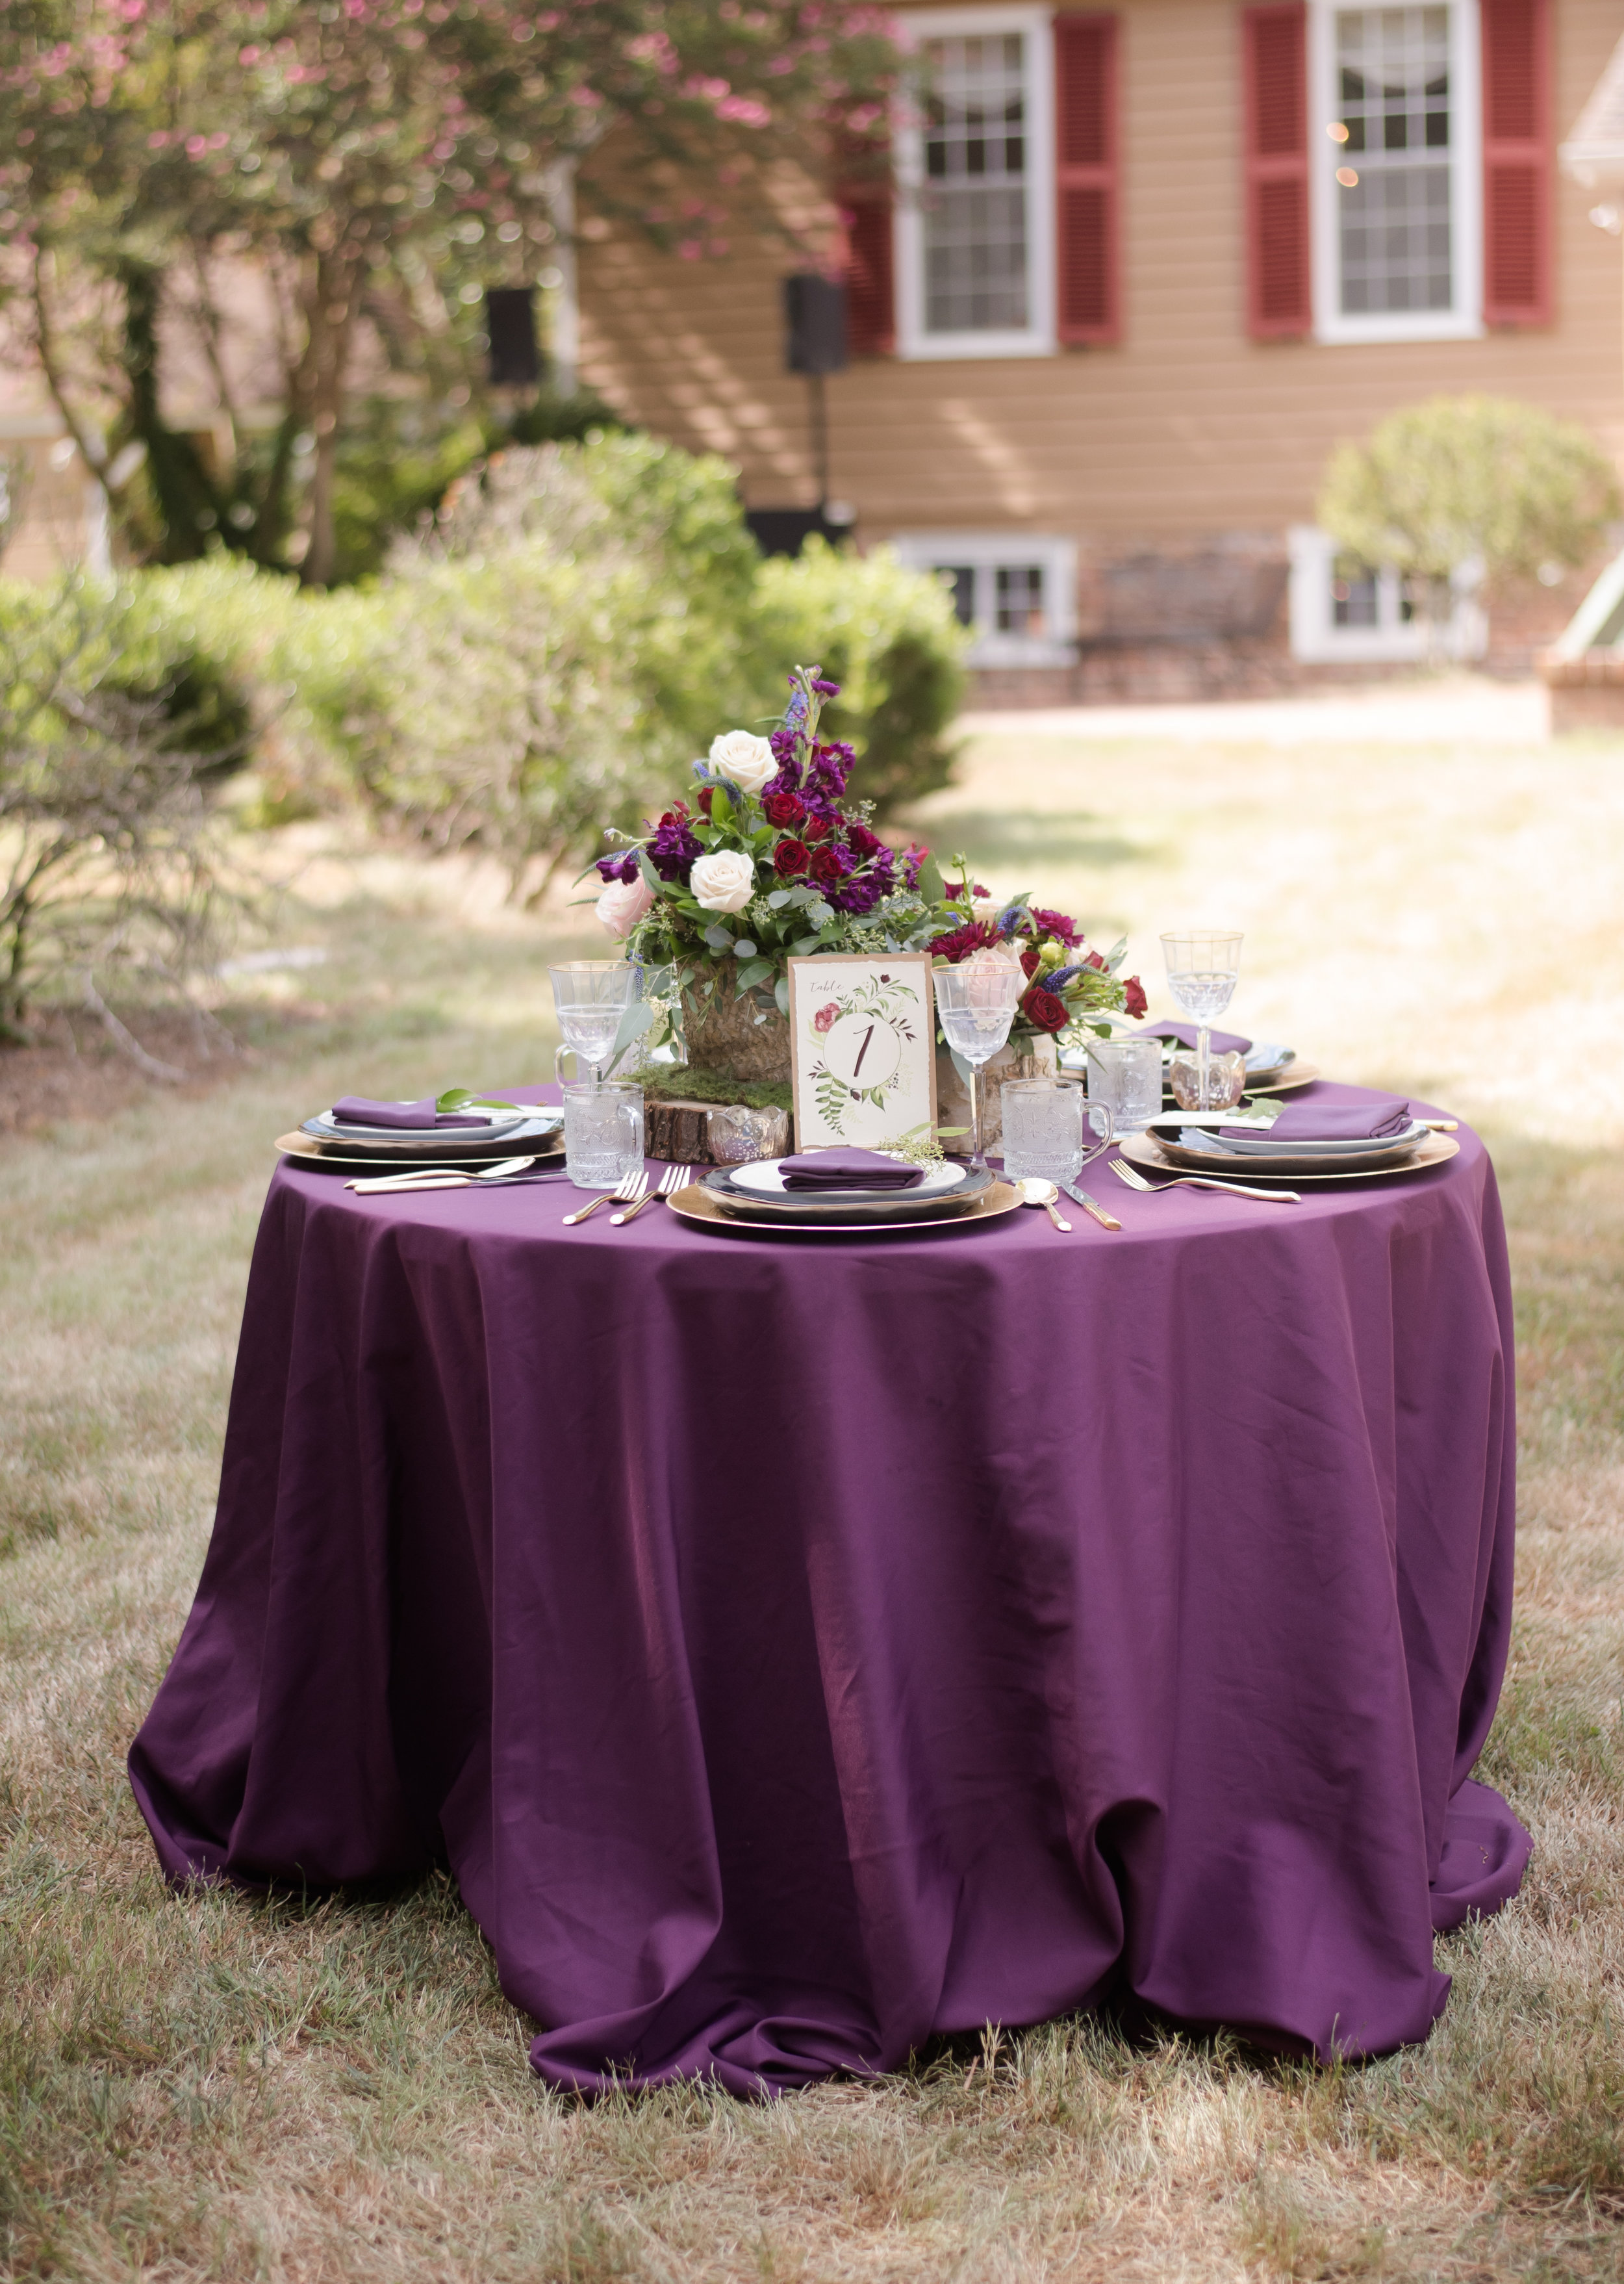 midsummers-eve-wedding-floral-blush-dress-david-tutera-cary-hill-plantation-photo-virginia-bride-31.jpg